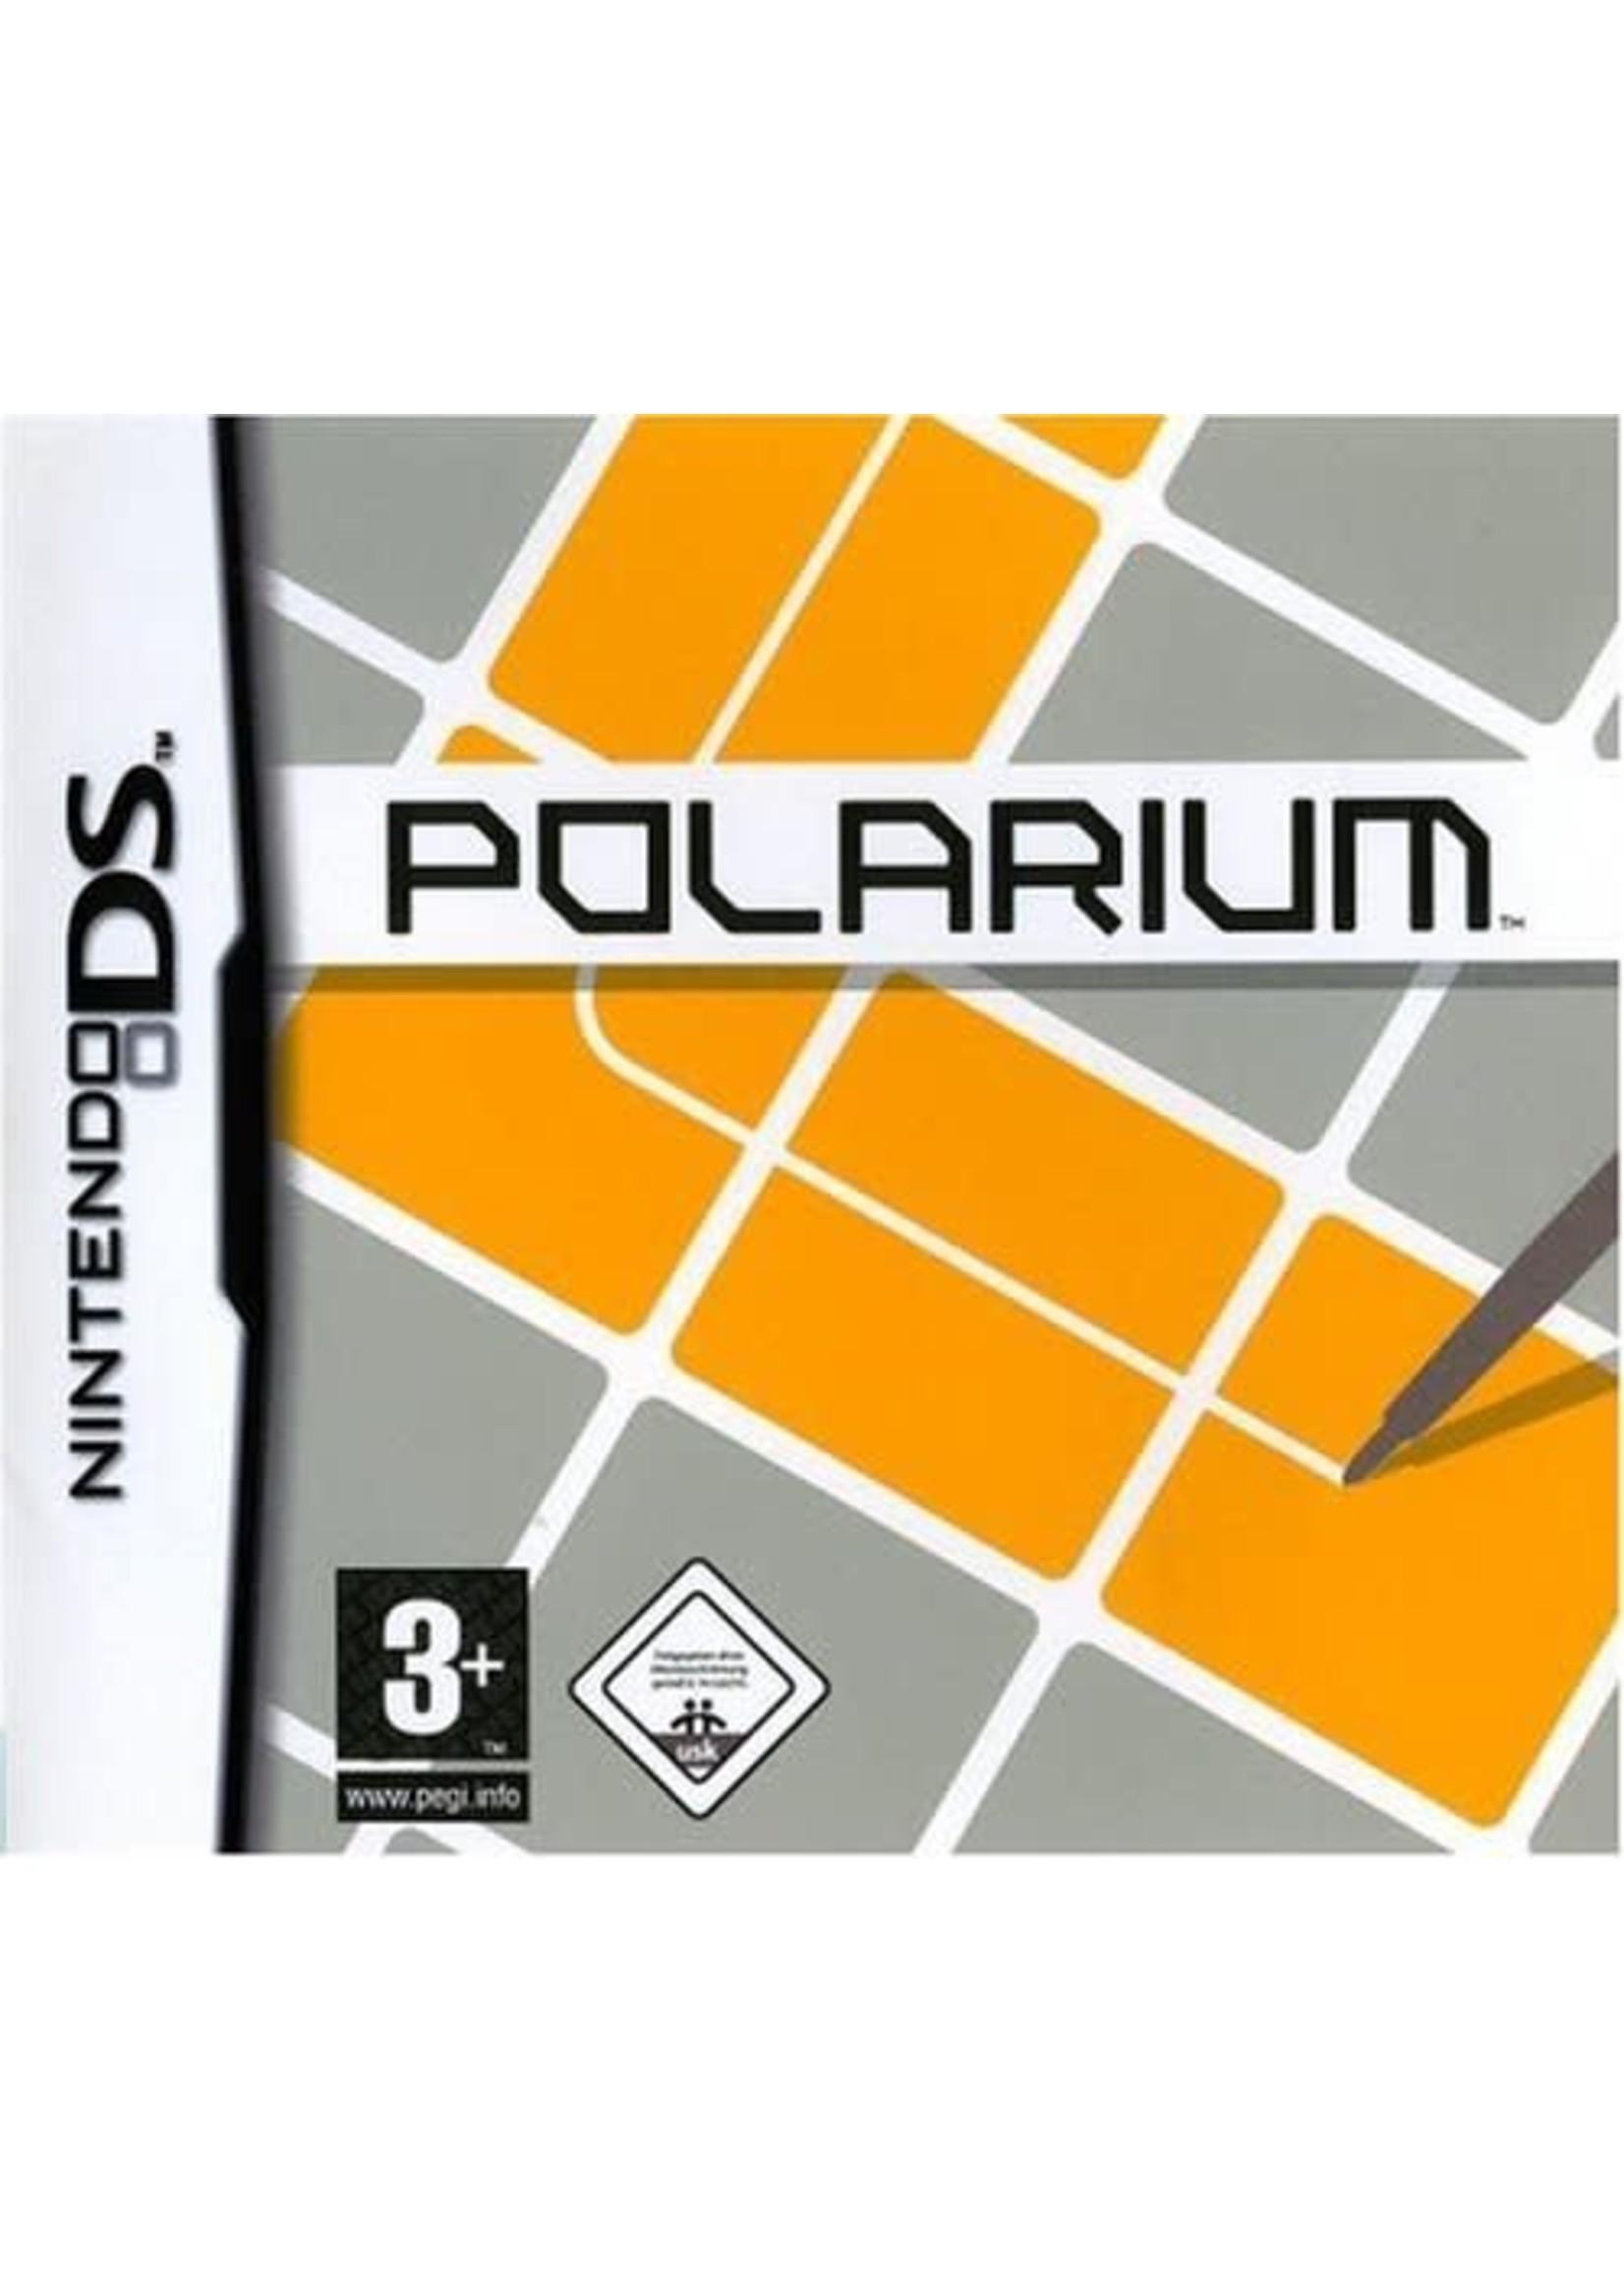 Polarium - NDS PrePlayed